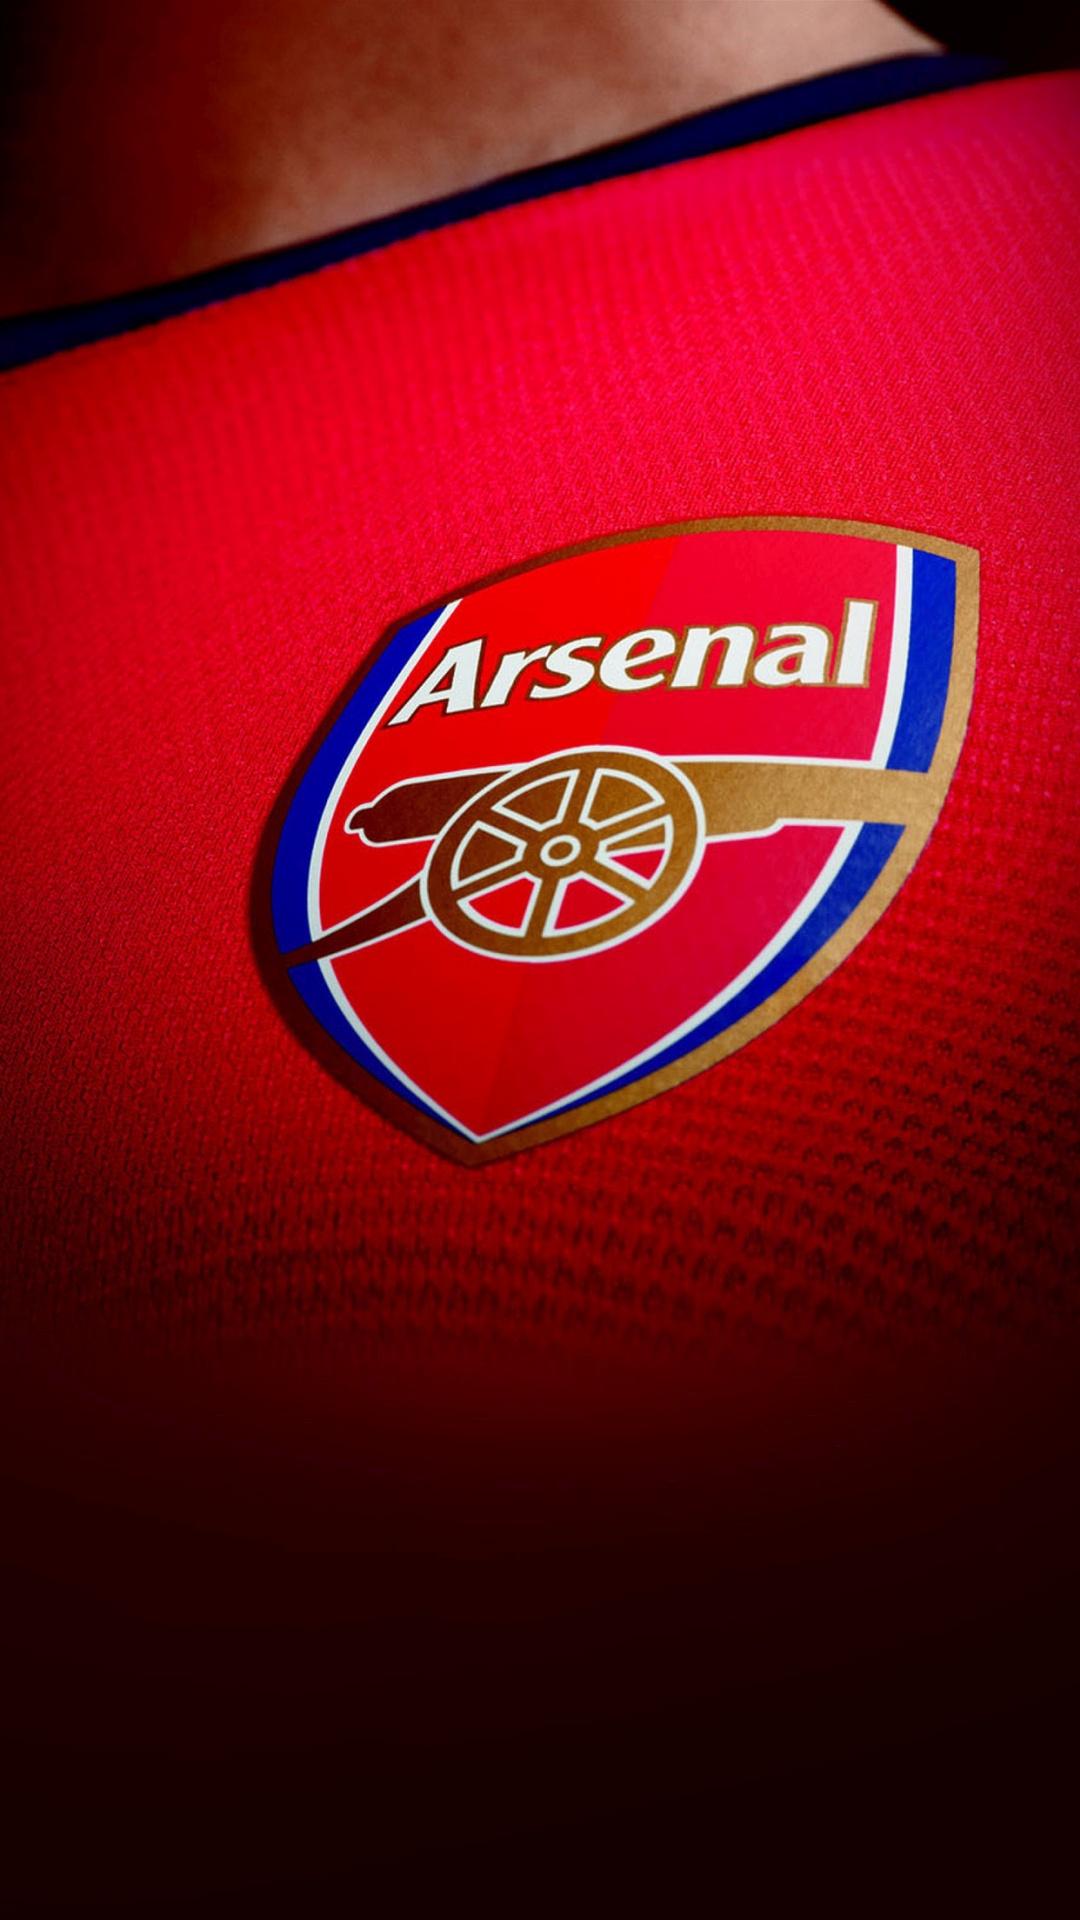 Arsenal Football Team Logo England Soccer iPhone 6 HD Wallpaper 1080x1920